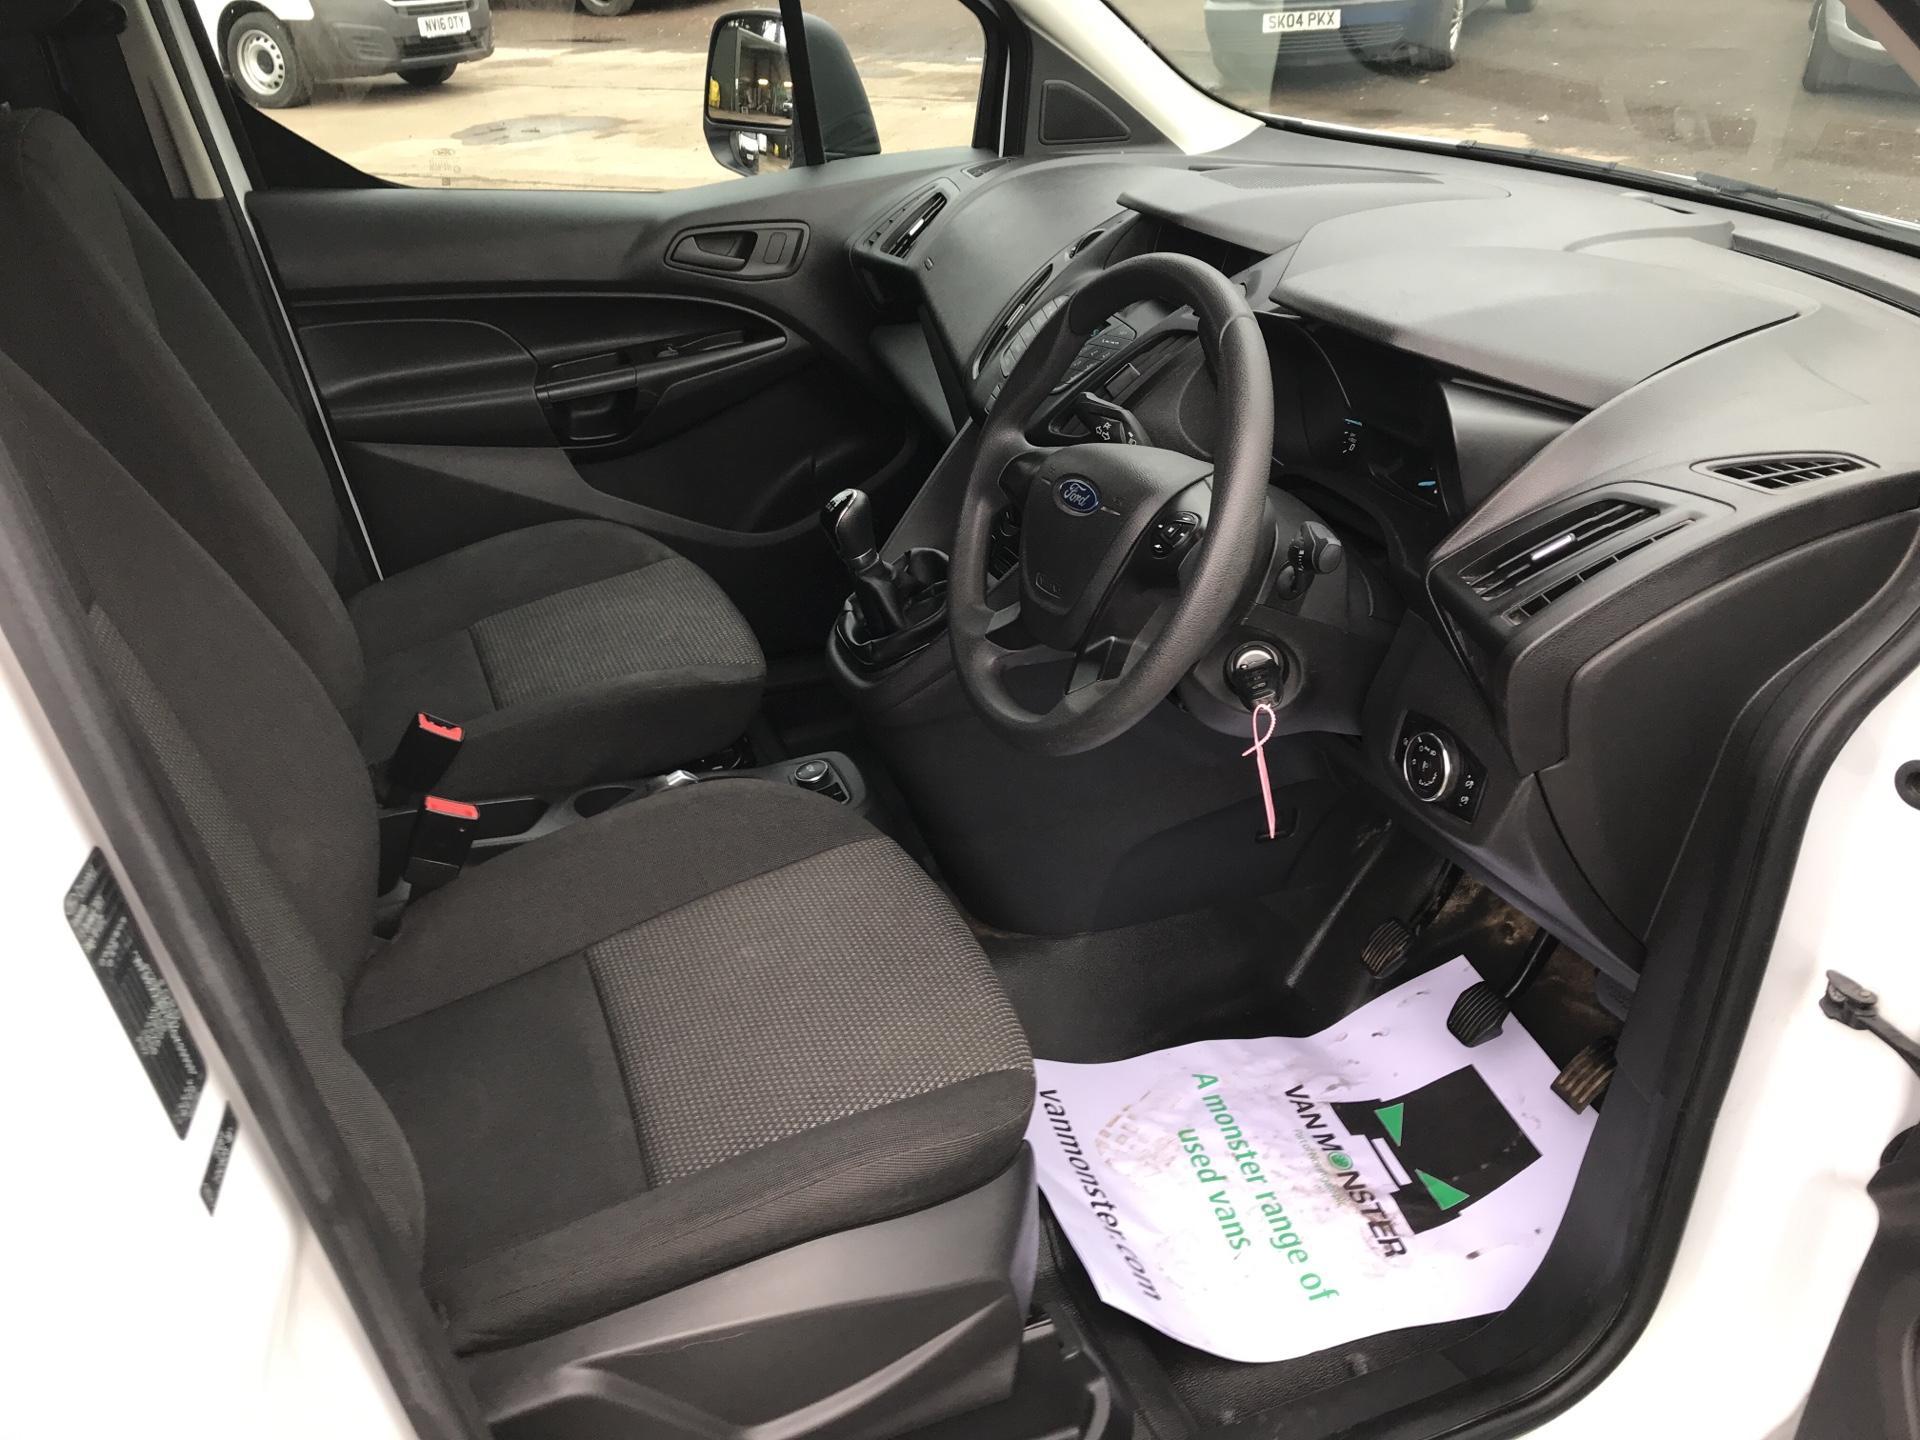 2016 Ford Transit Connect 200 L1 DIESEL 1.5 TDCI 75PS VAN EURO 6 (WU66XGE) Image 9